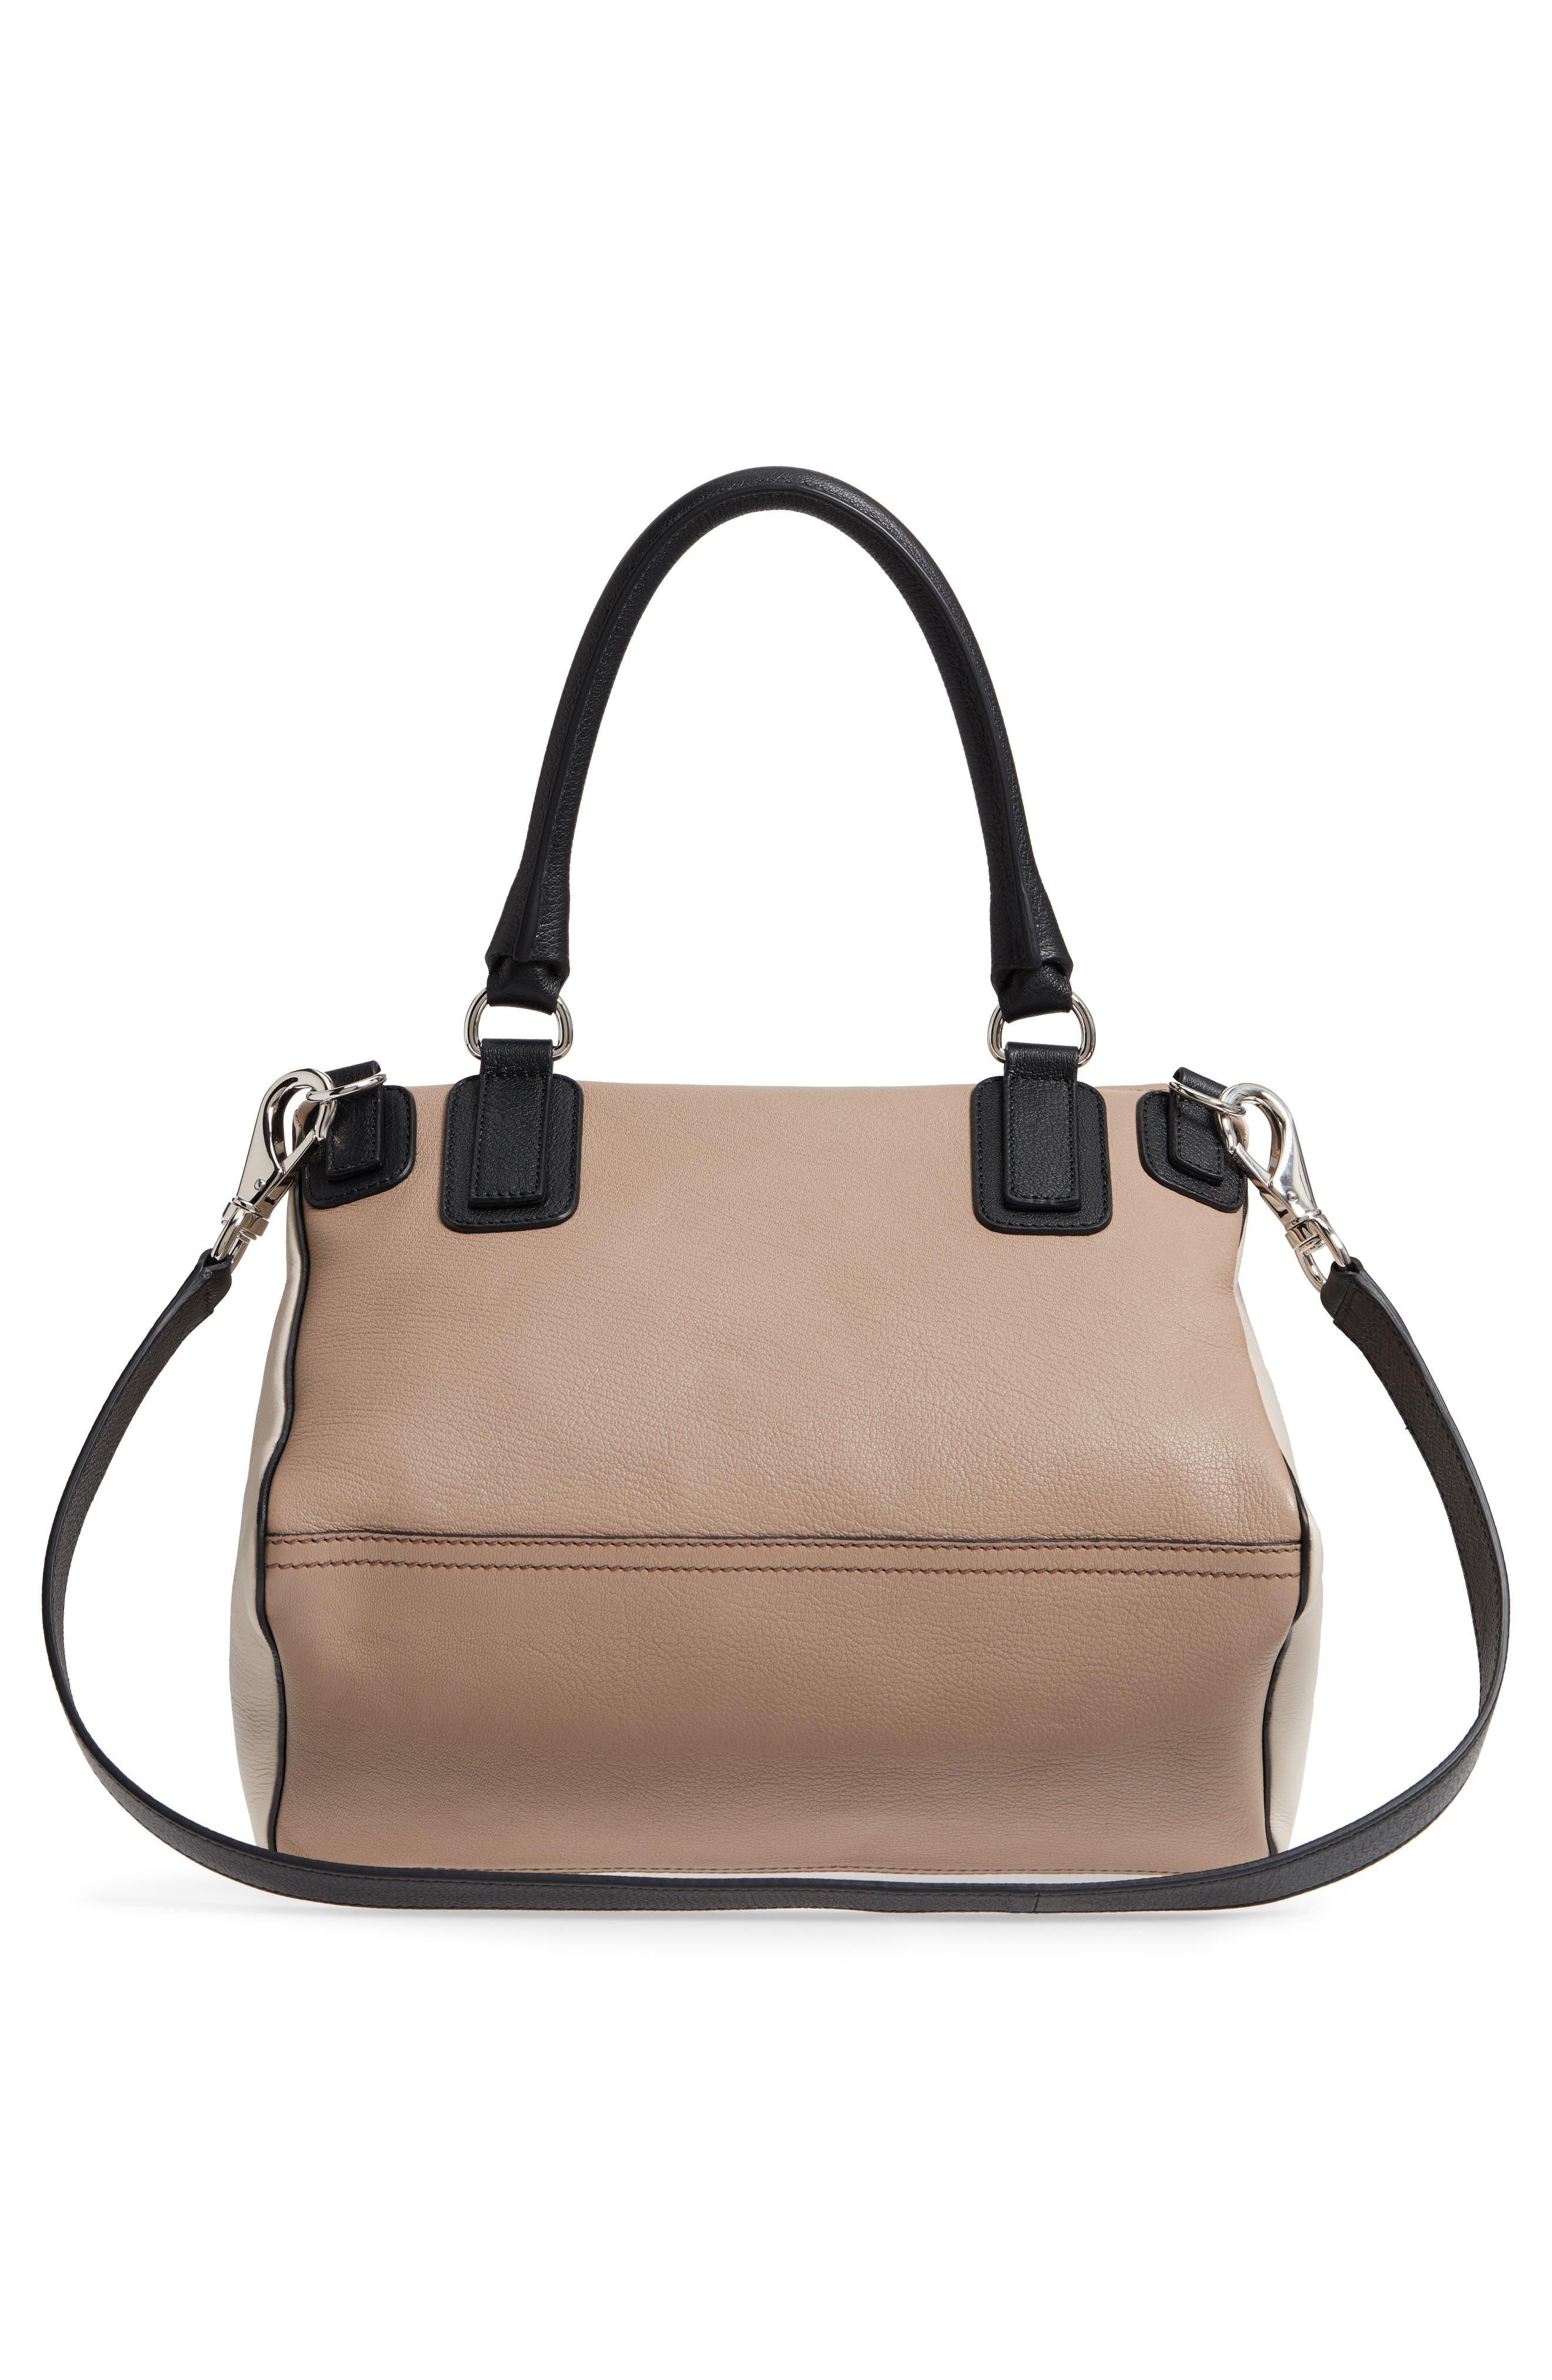 Medium Pandora Box Tricolor Leather Crossbody Bag,                             Alternate thumbnail 3, color,                             250